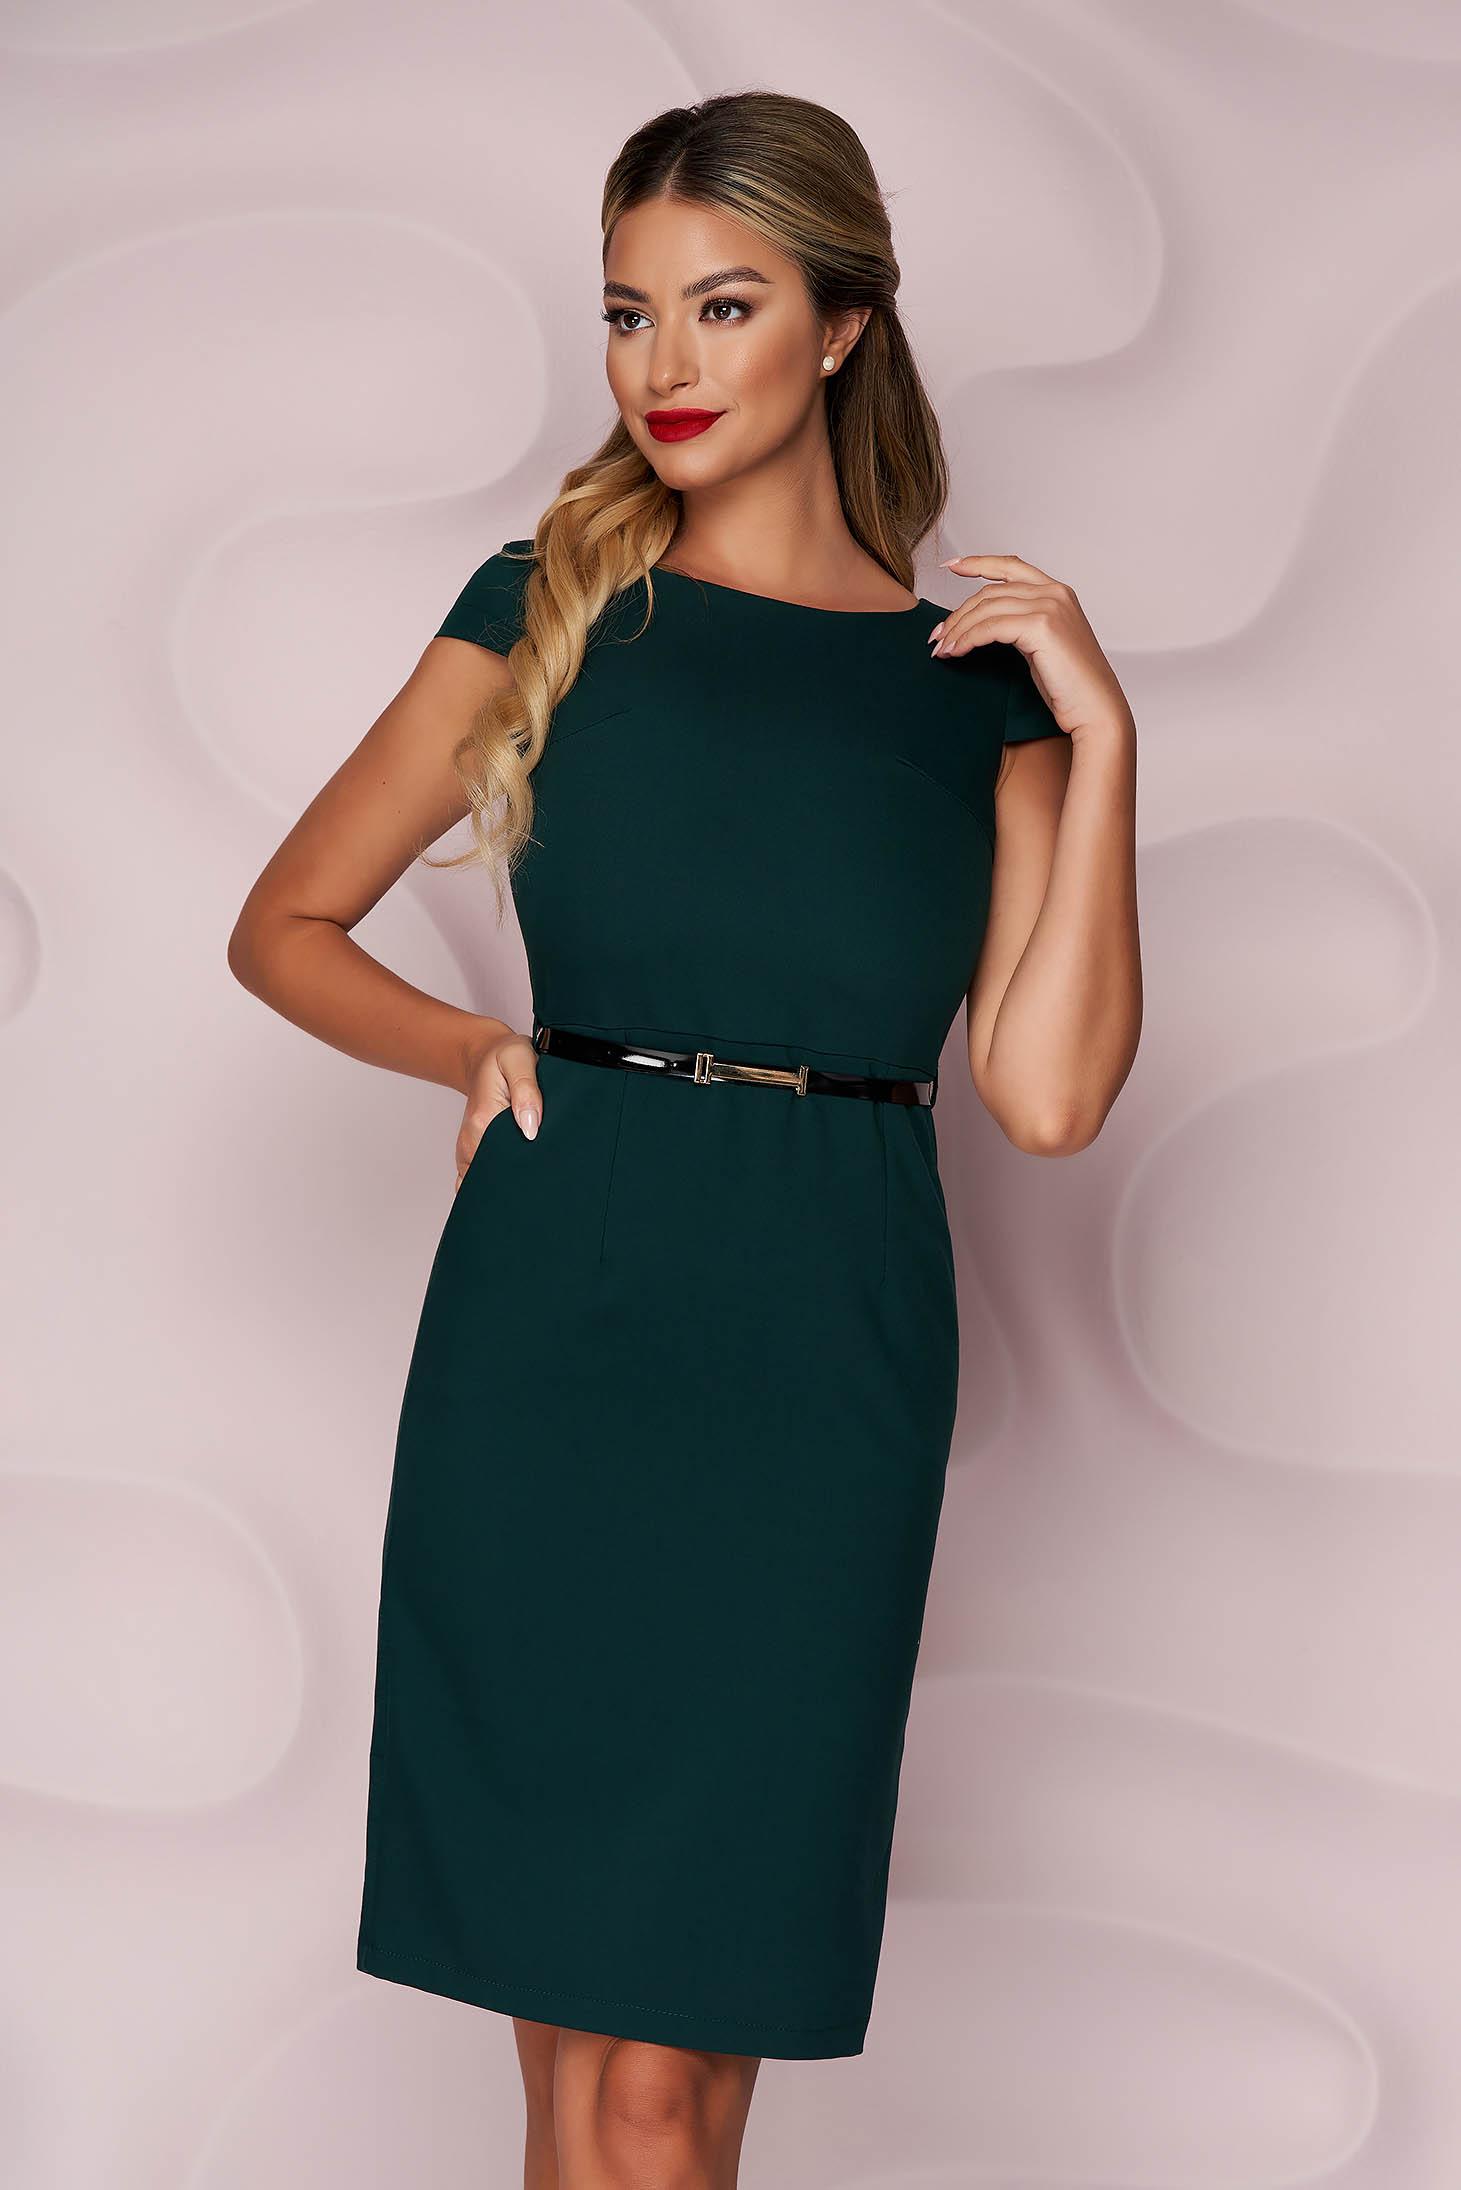 StarShinerS darkgreen dress office midi pencil cloth thin fabric nonelastic fabric accessorized with belt